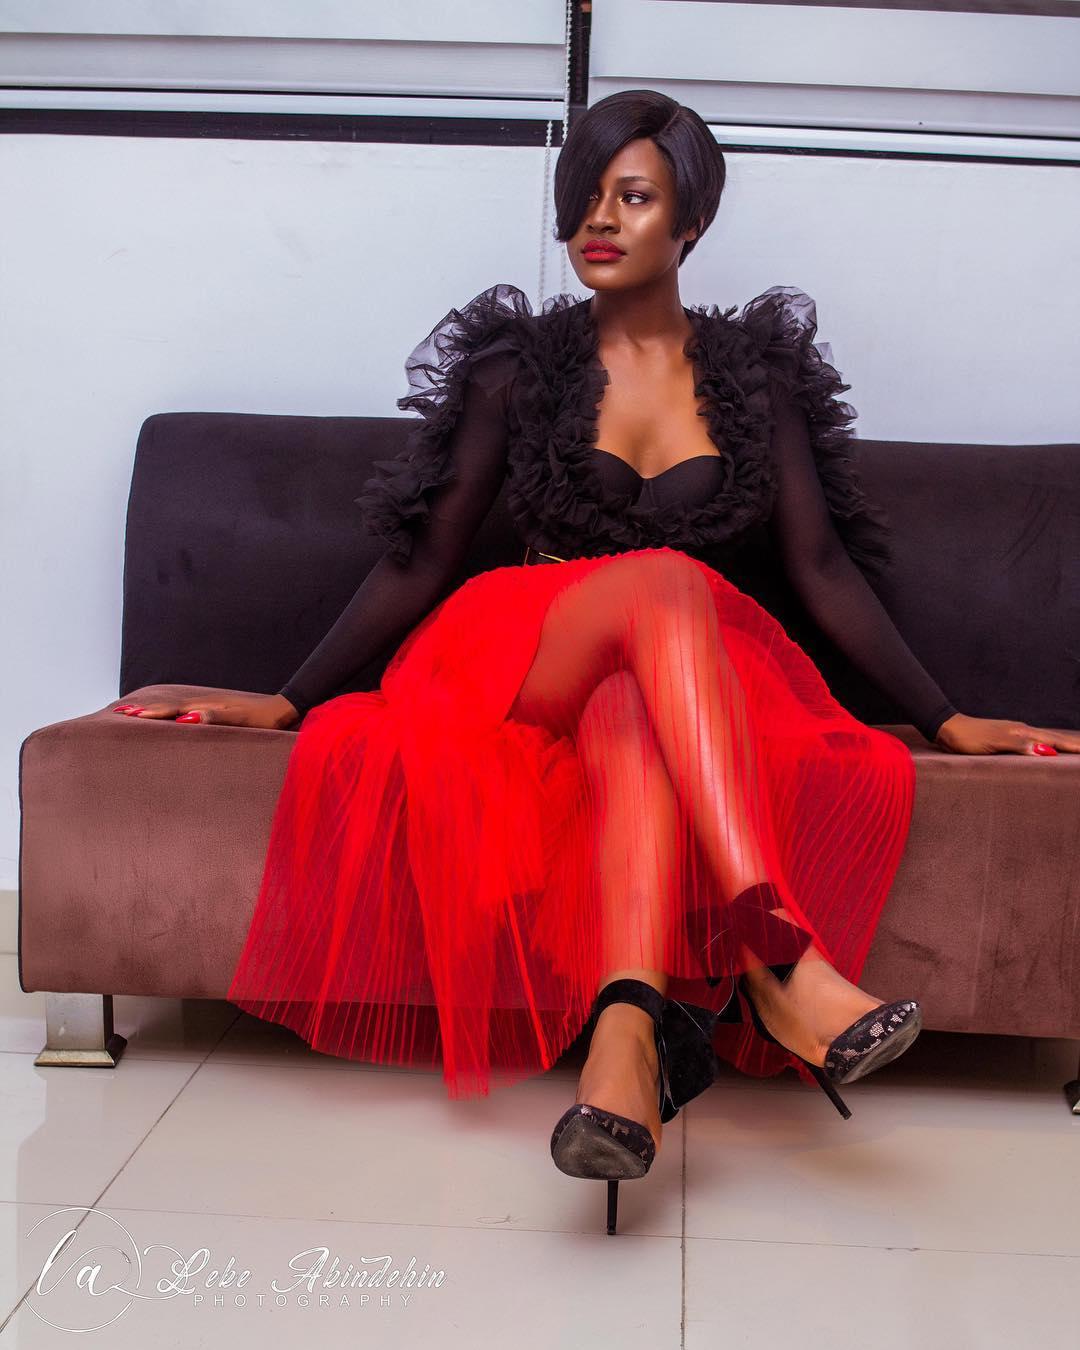 9169051 al2 jpeg34b6b291308ff10767bd608310546874 - BBNaija Alex spotted with TeddyA and 2baba at Campari Lagos Party [Photos]